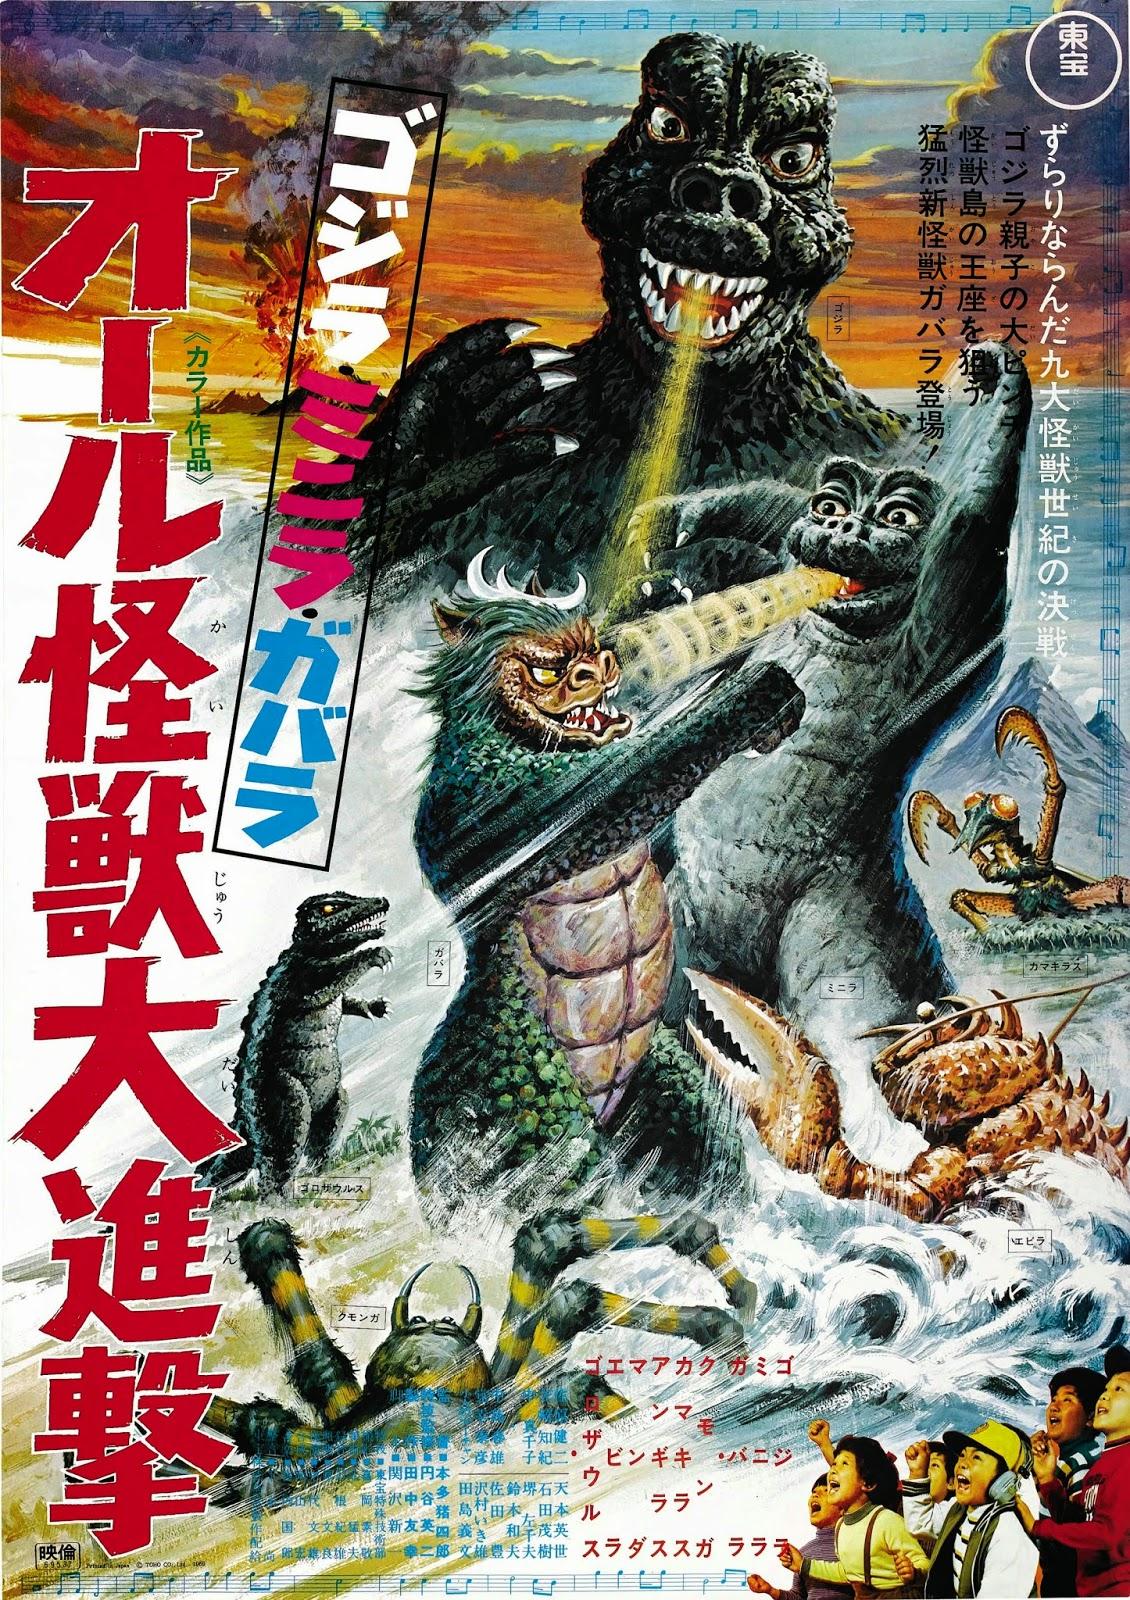 http://fr.wikipedia.org/wiki/Godzilla%27s_Revenge